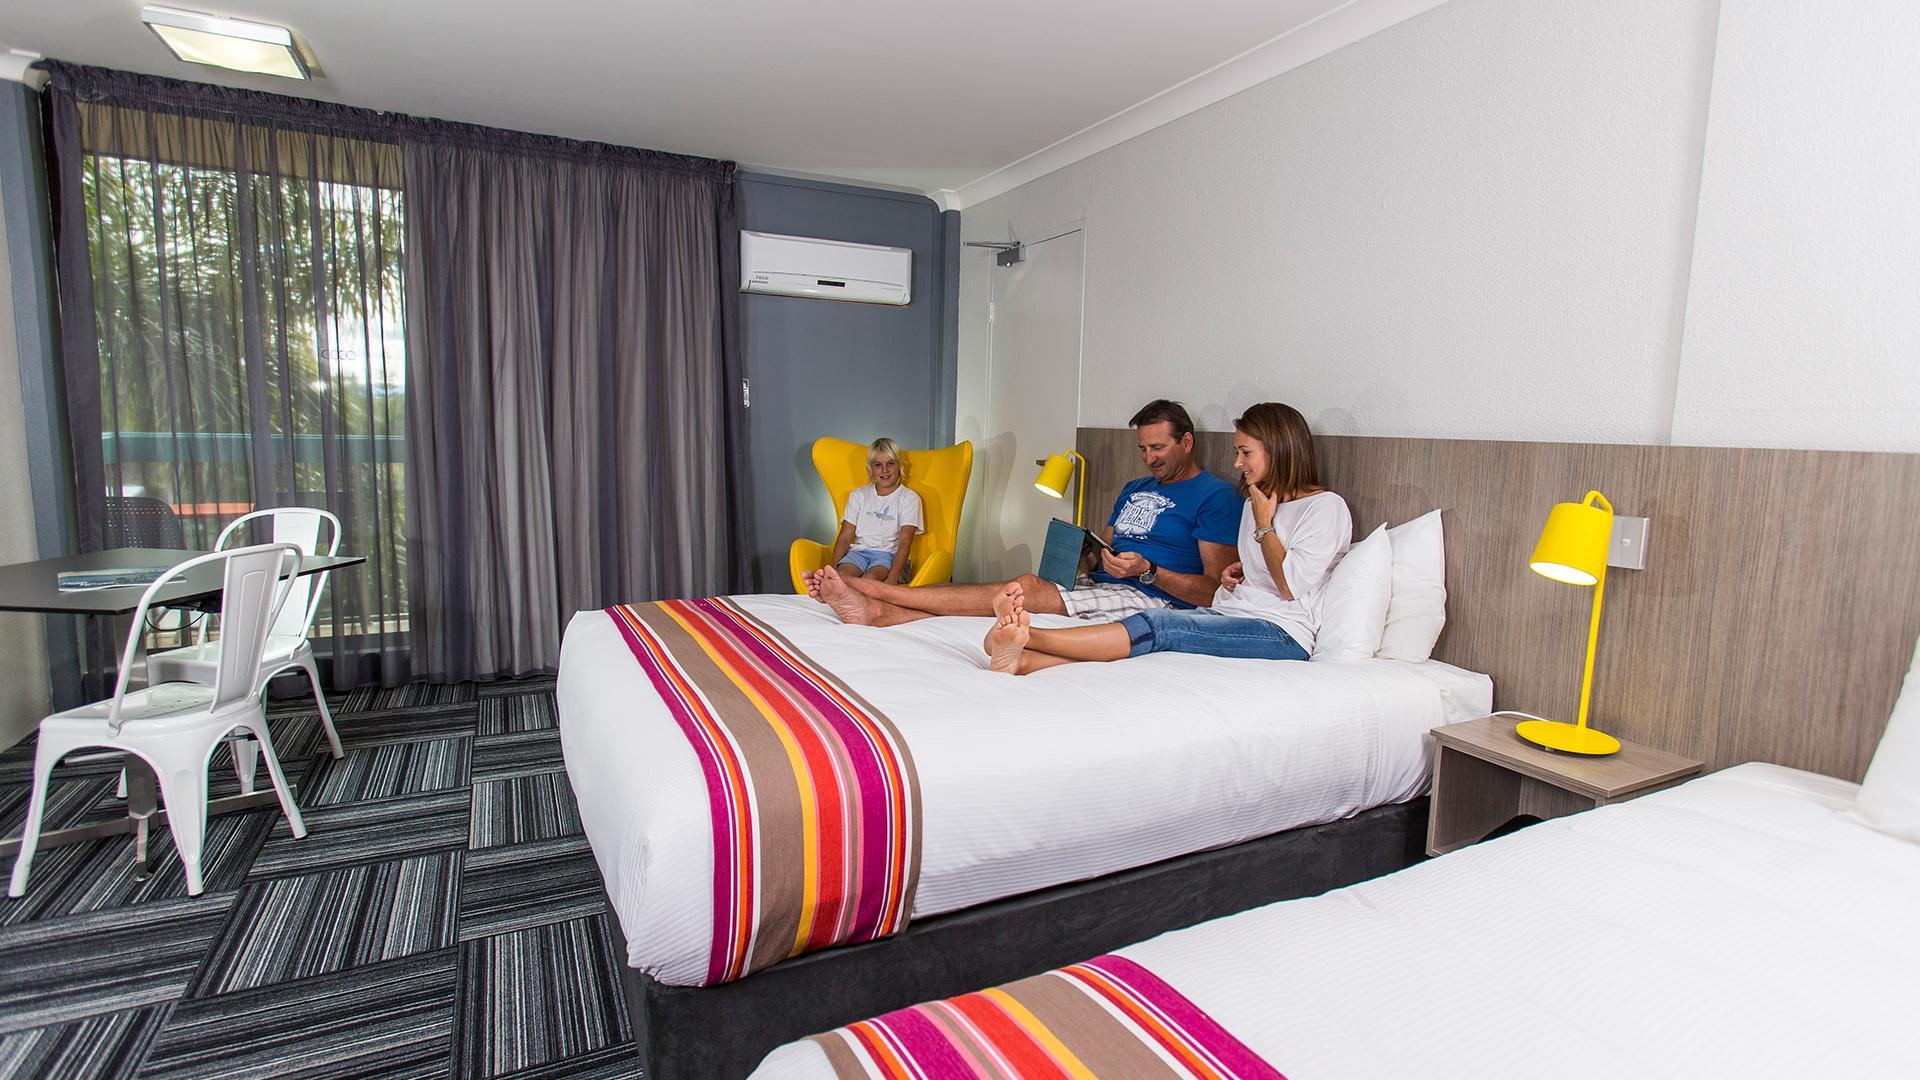 Superior Resort Room image 1 at Paradise Resort Gold Coast by City of Gold Coast, Queensland, Australia